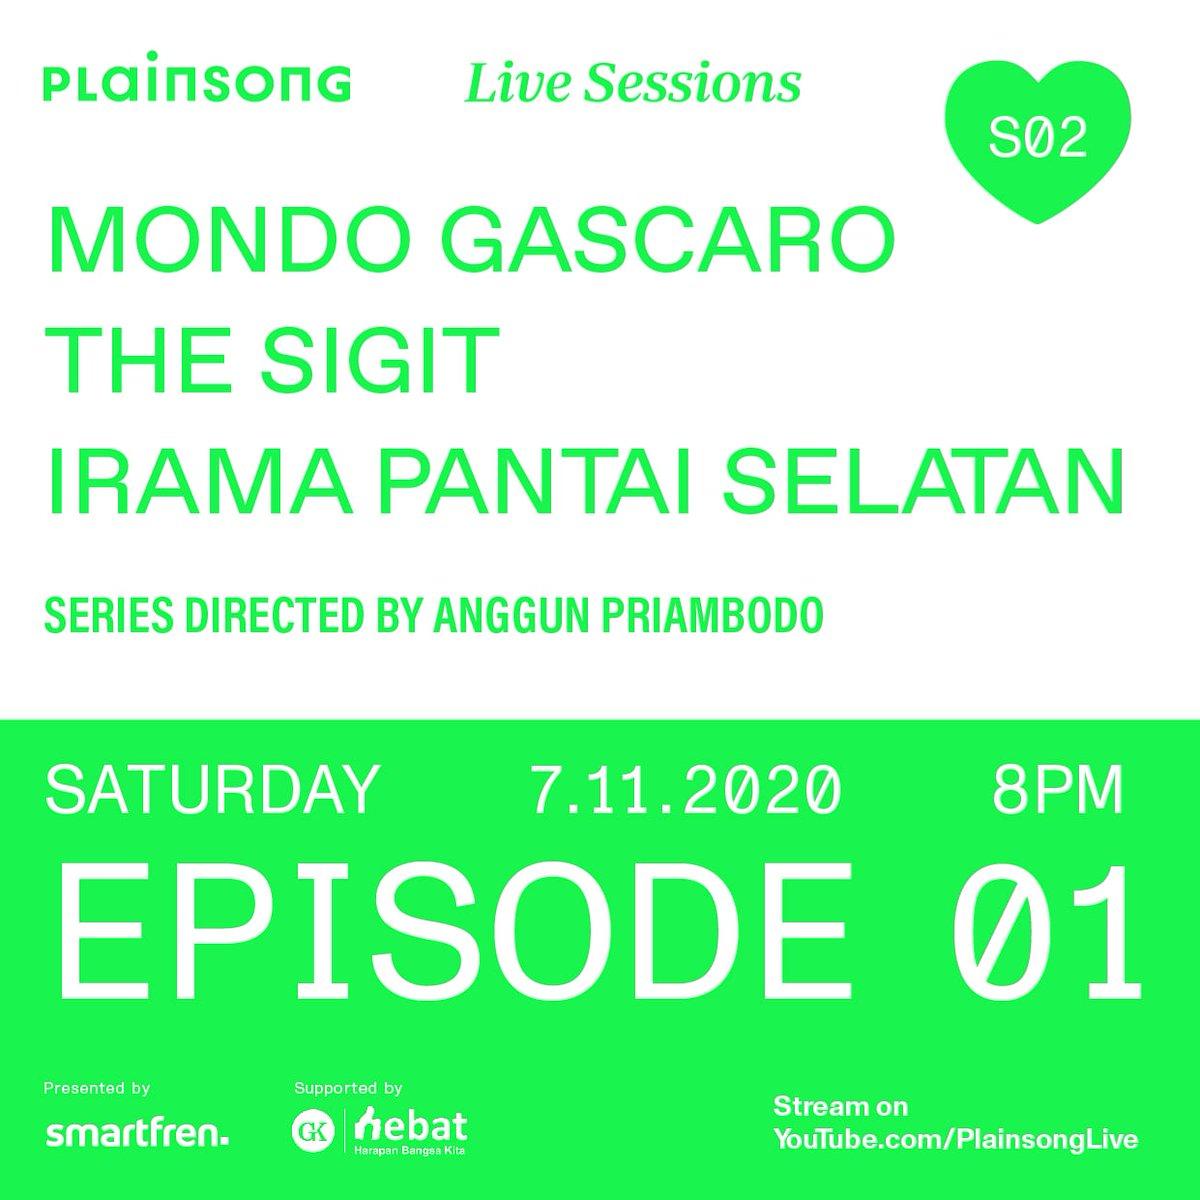 Kami main di episode 01 Plainsong Live Sessions season 2. Tayang Sabtu besok. Follow @plainsonglive dulu. https://t.co/rbZdwHb0z0